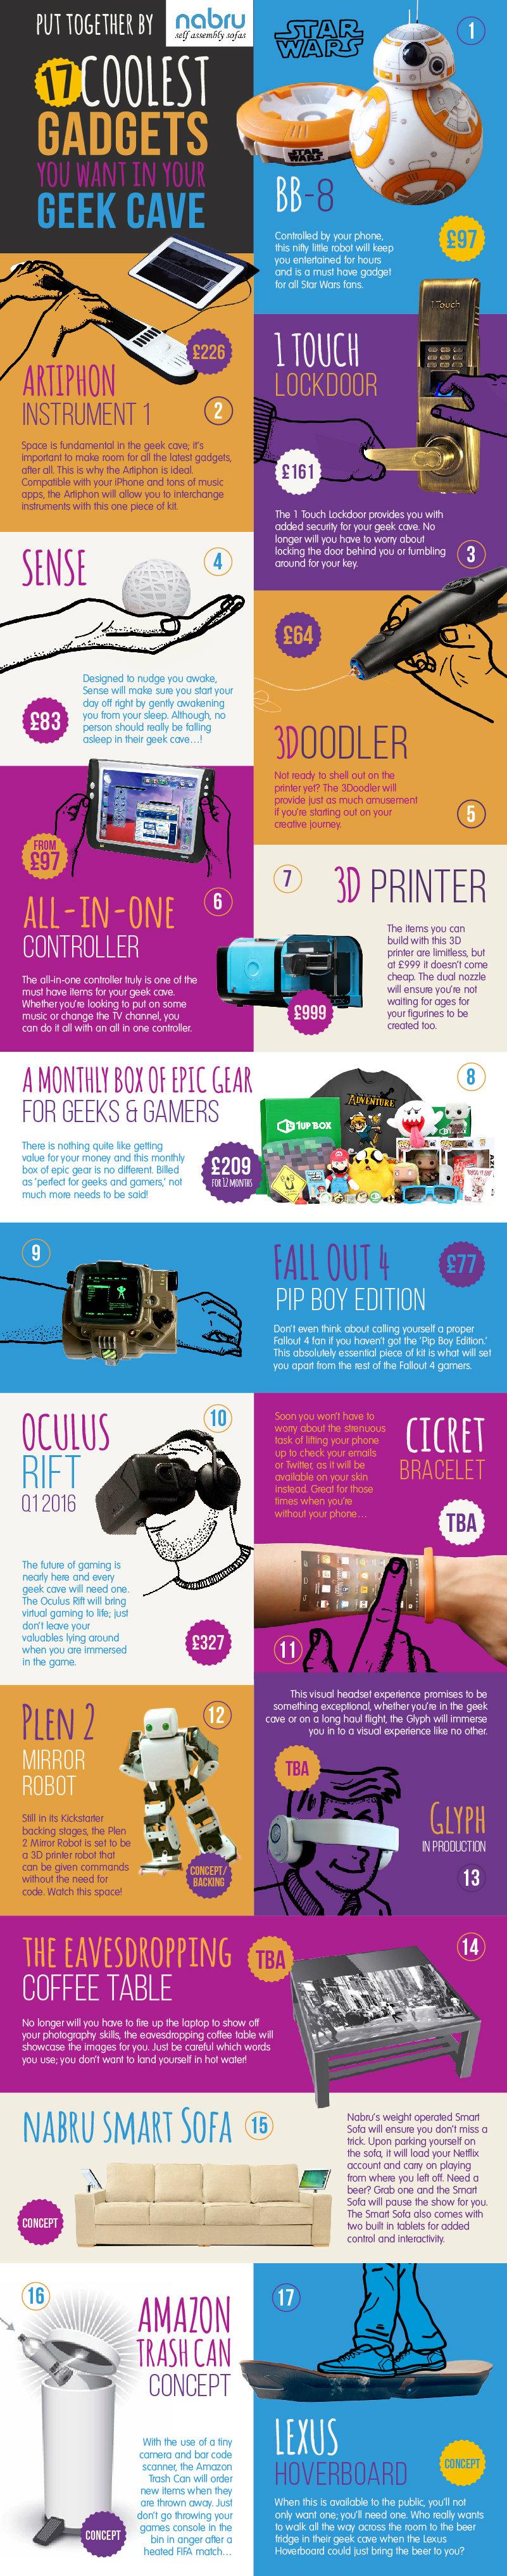 Nabru infographic geeky gadgets